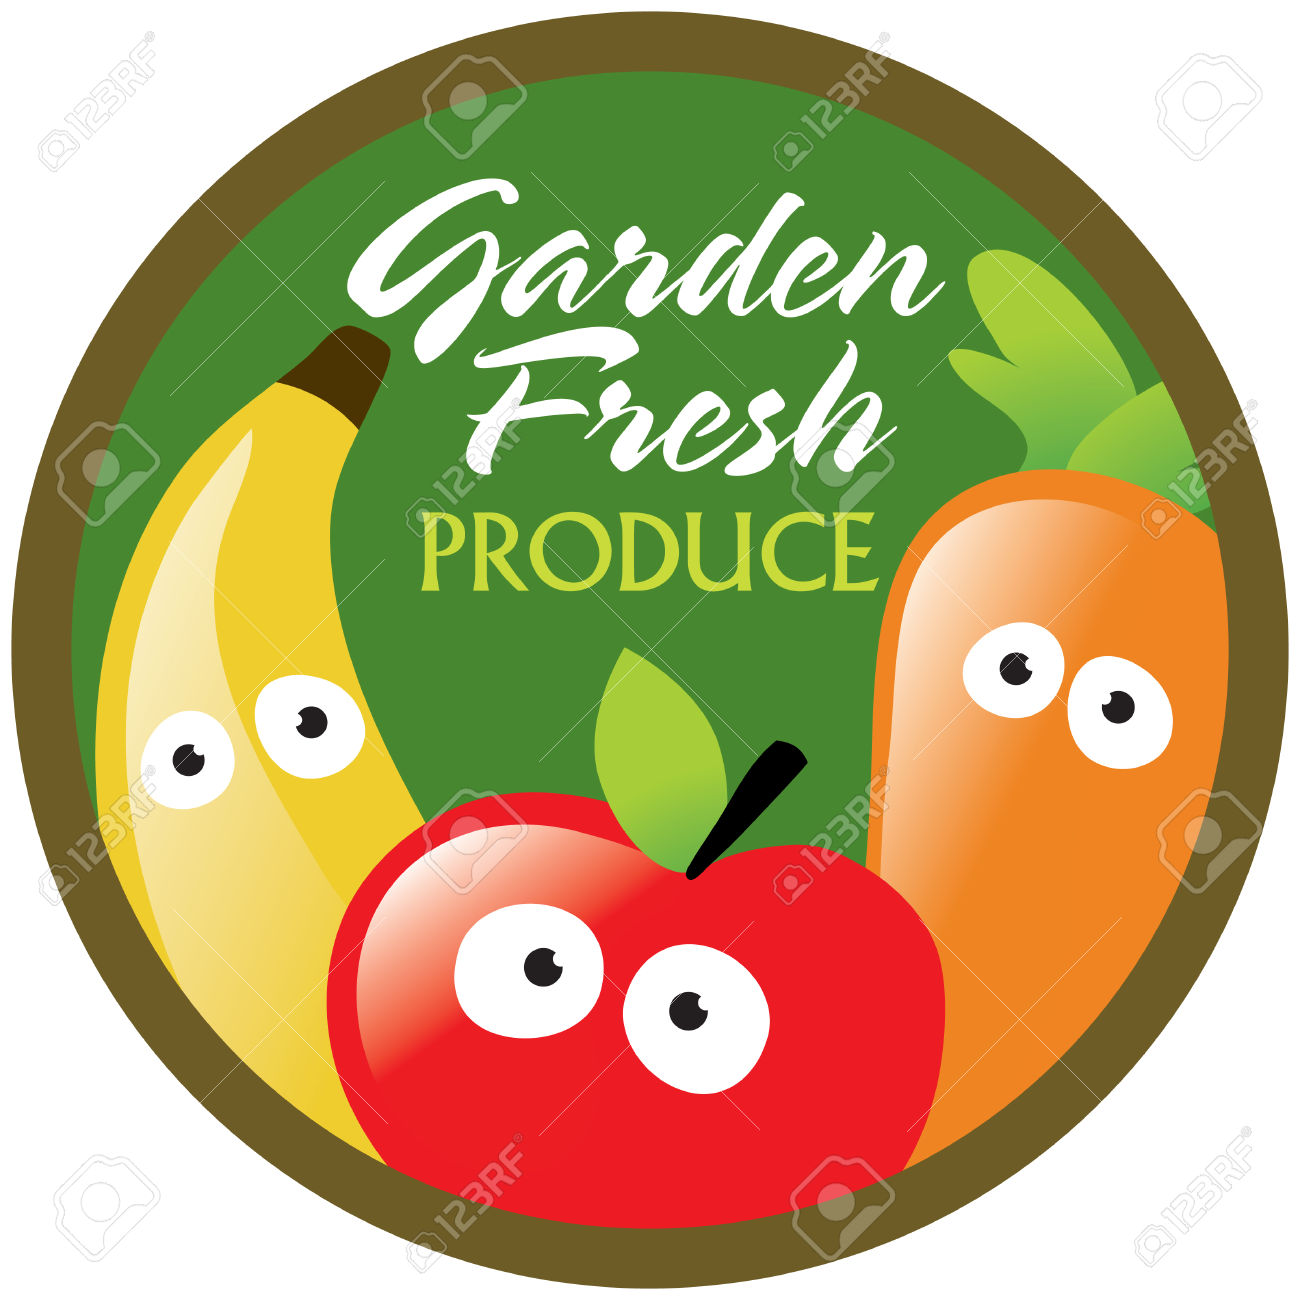 Garden Fresh Produce Label/sticker Royalty Free Cliparts, Vectors.